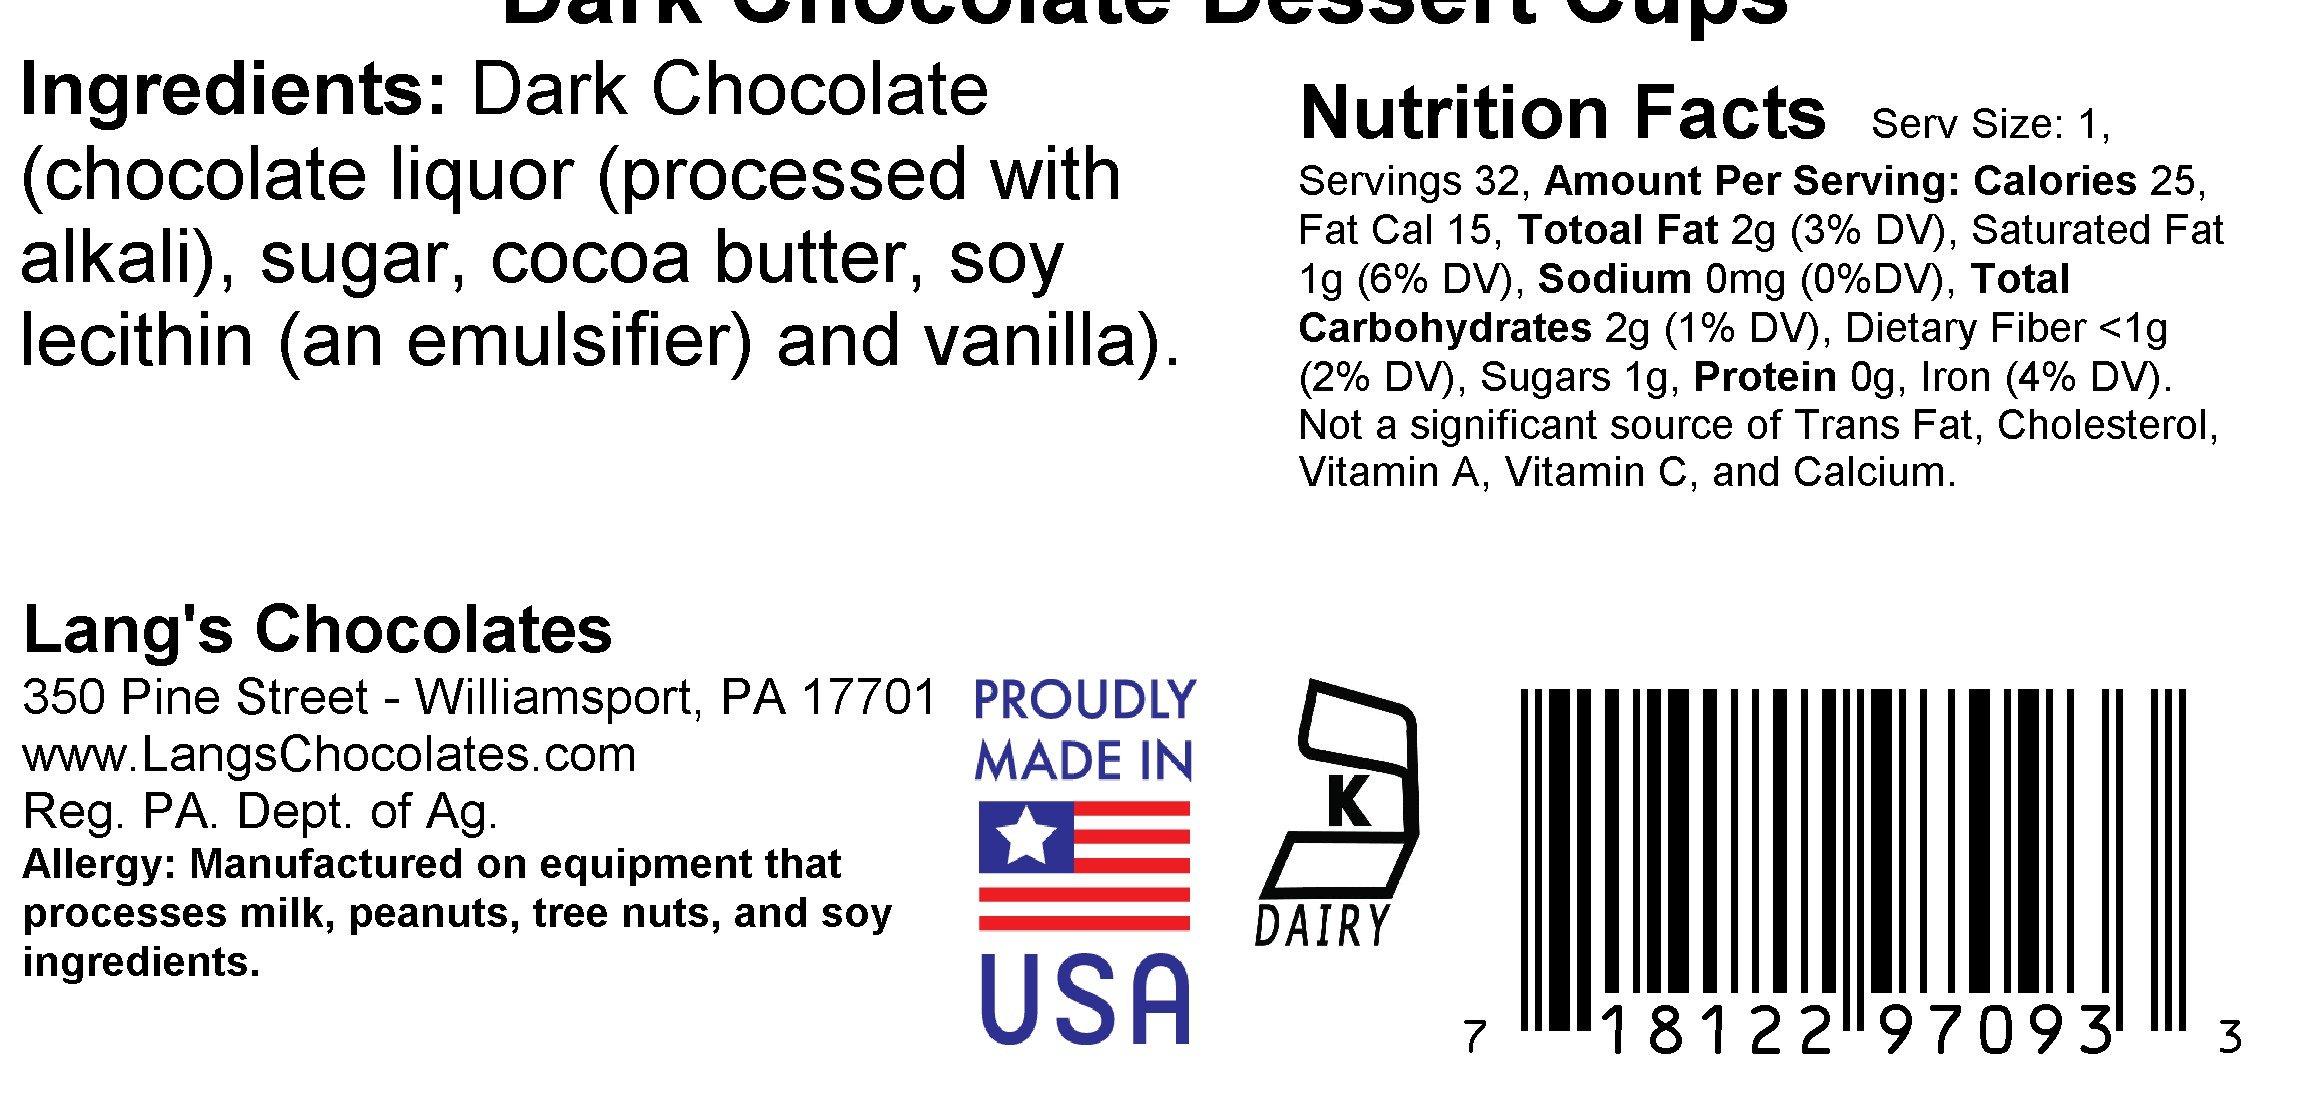 64 Dark Chocolate Dessert Cups Certified Kosher-dairy by Lang's Chocolates